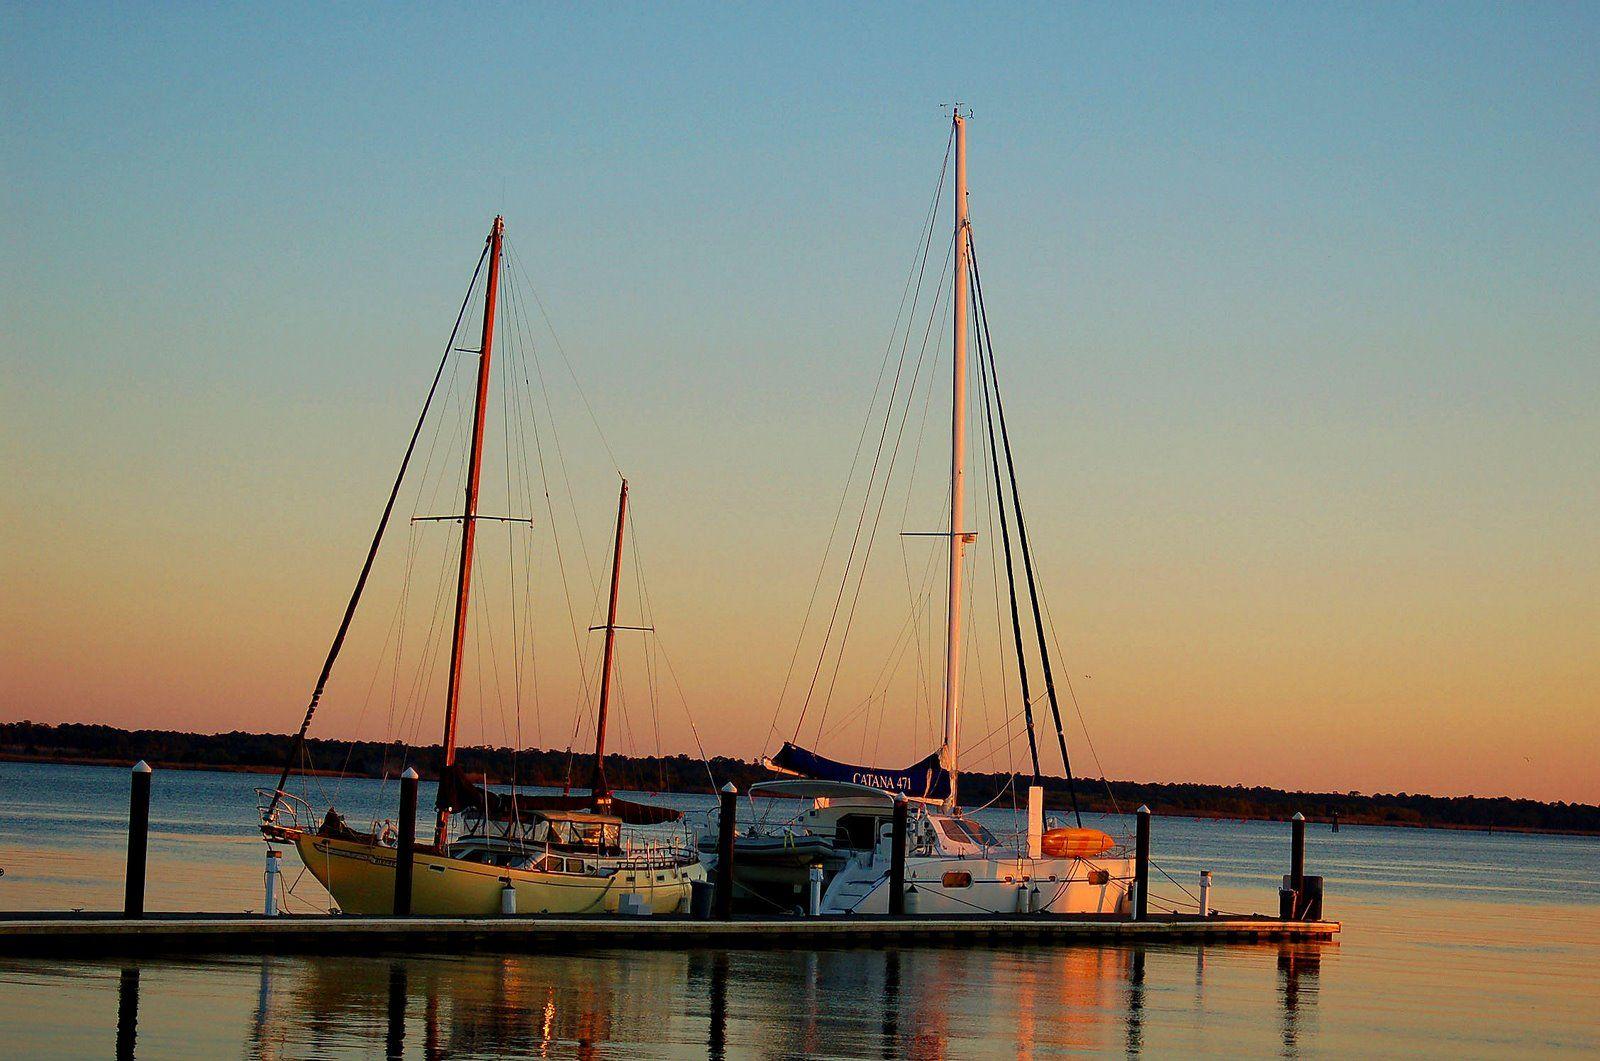 boats in Georgetown, SC